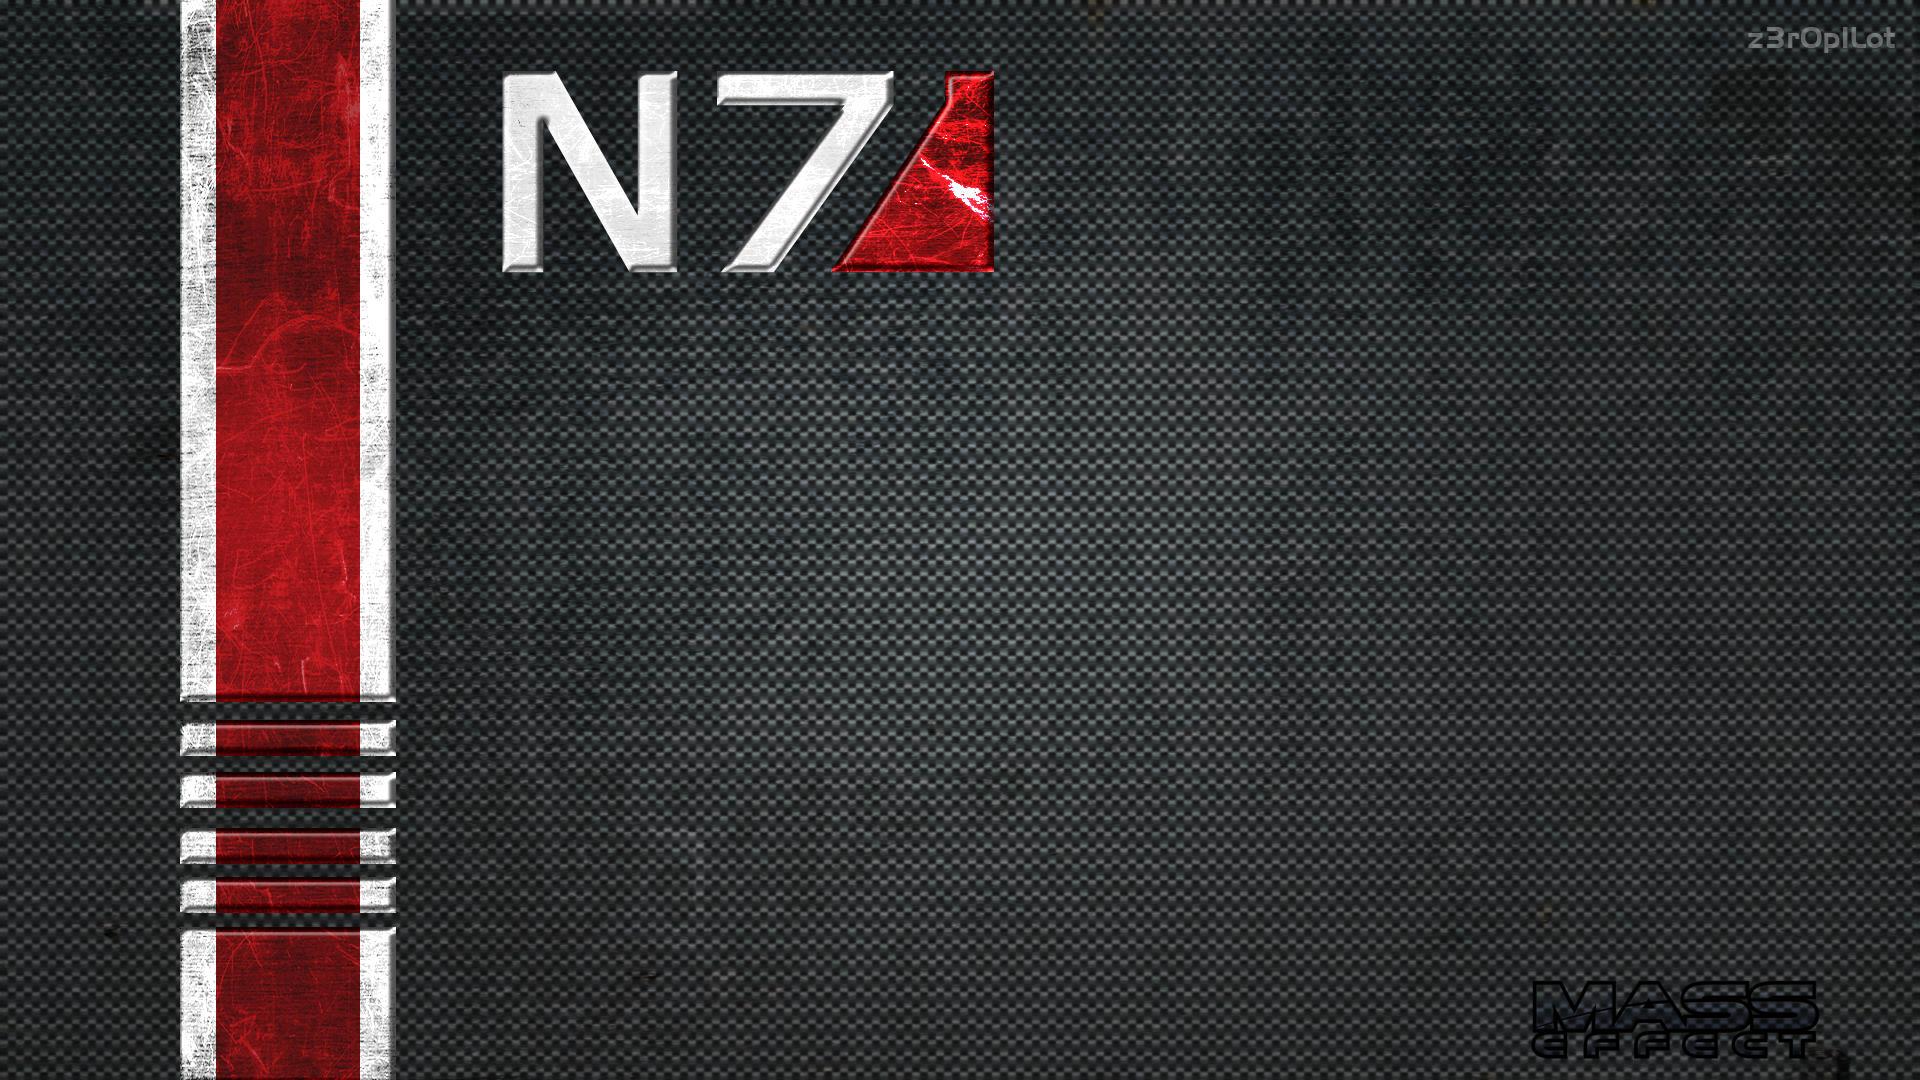 N Wallpaper By Z R P Lot on Carbon Fiber Texture